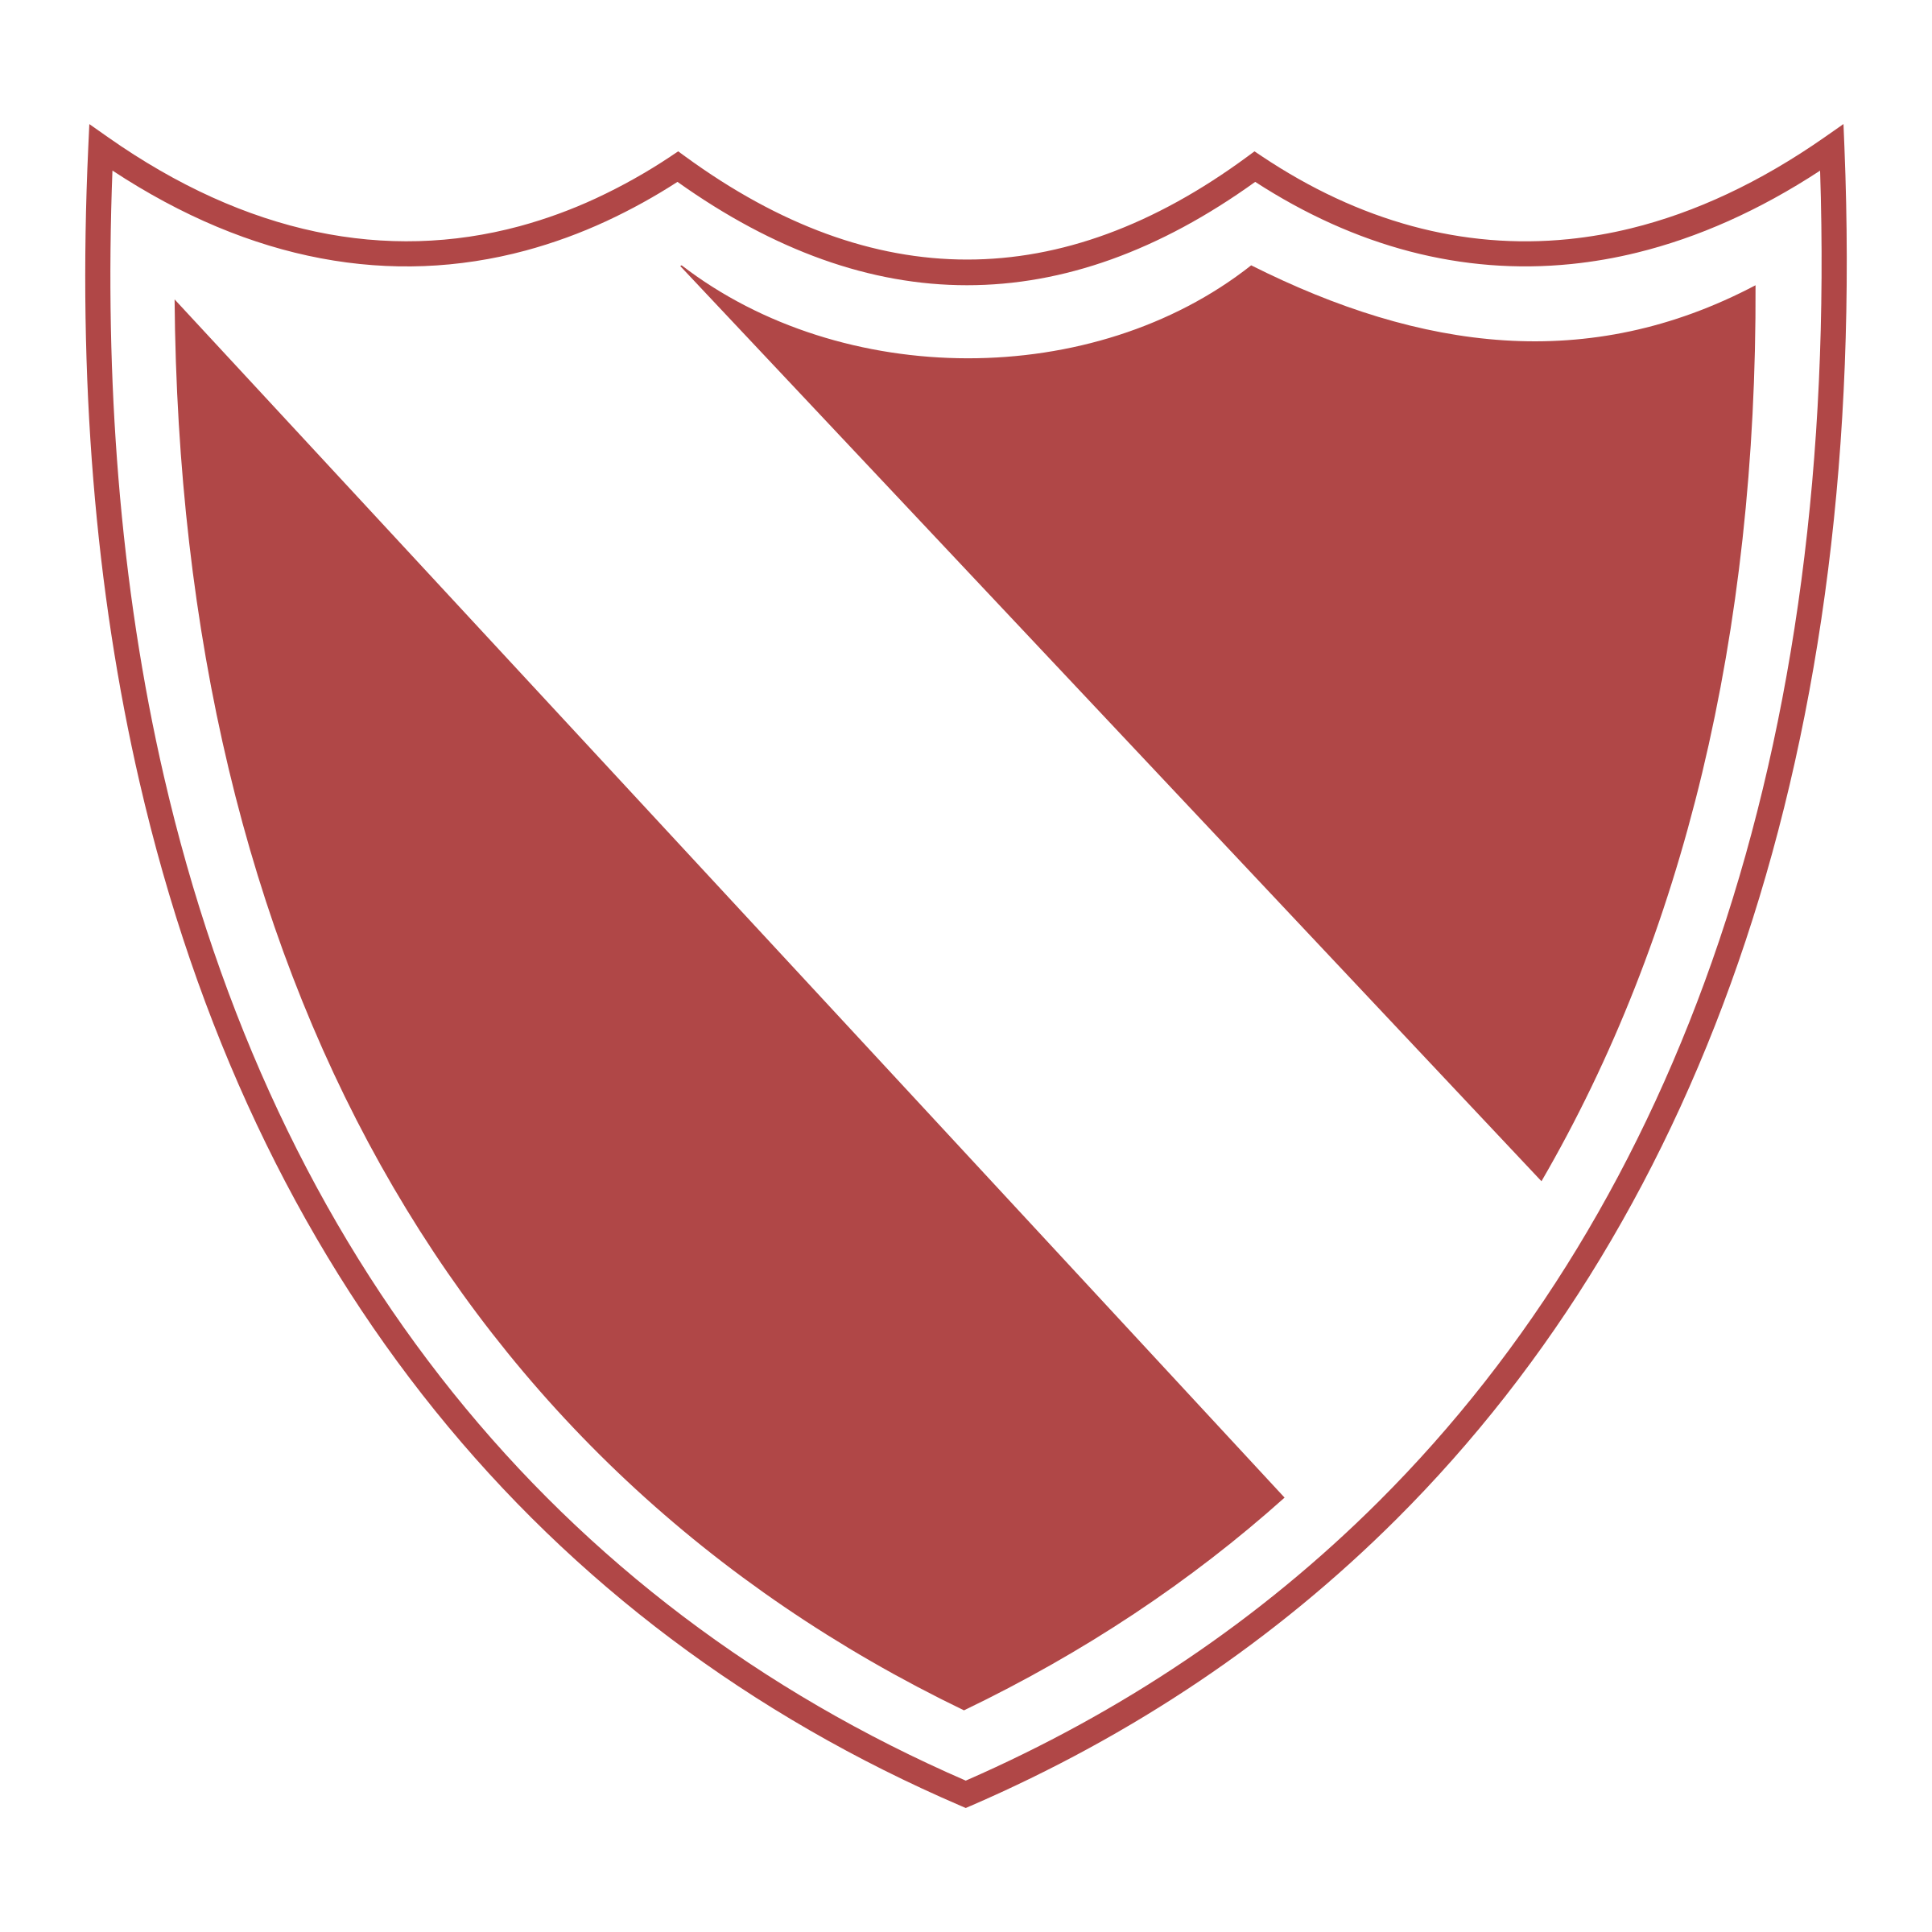 Club Atletico Independiente de Gualeguaychu Logo PNG Transparent.